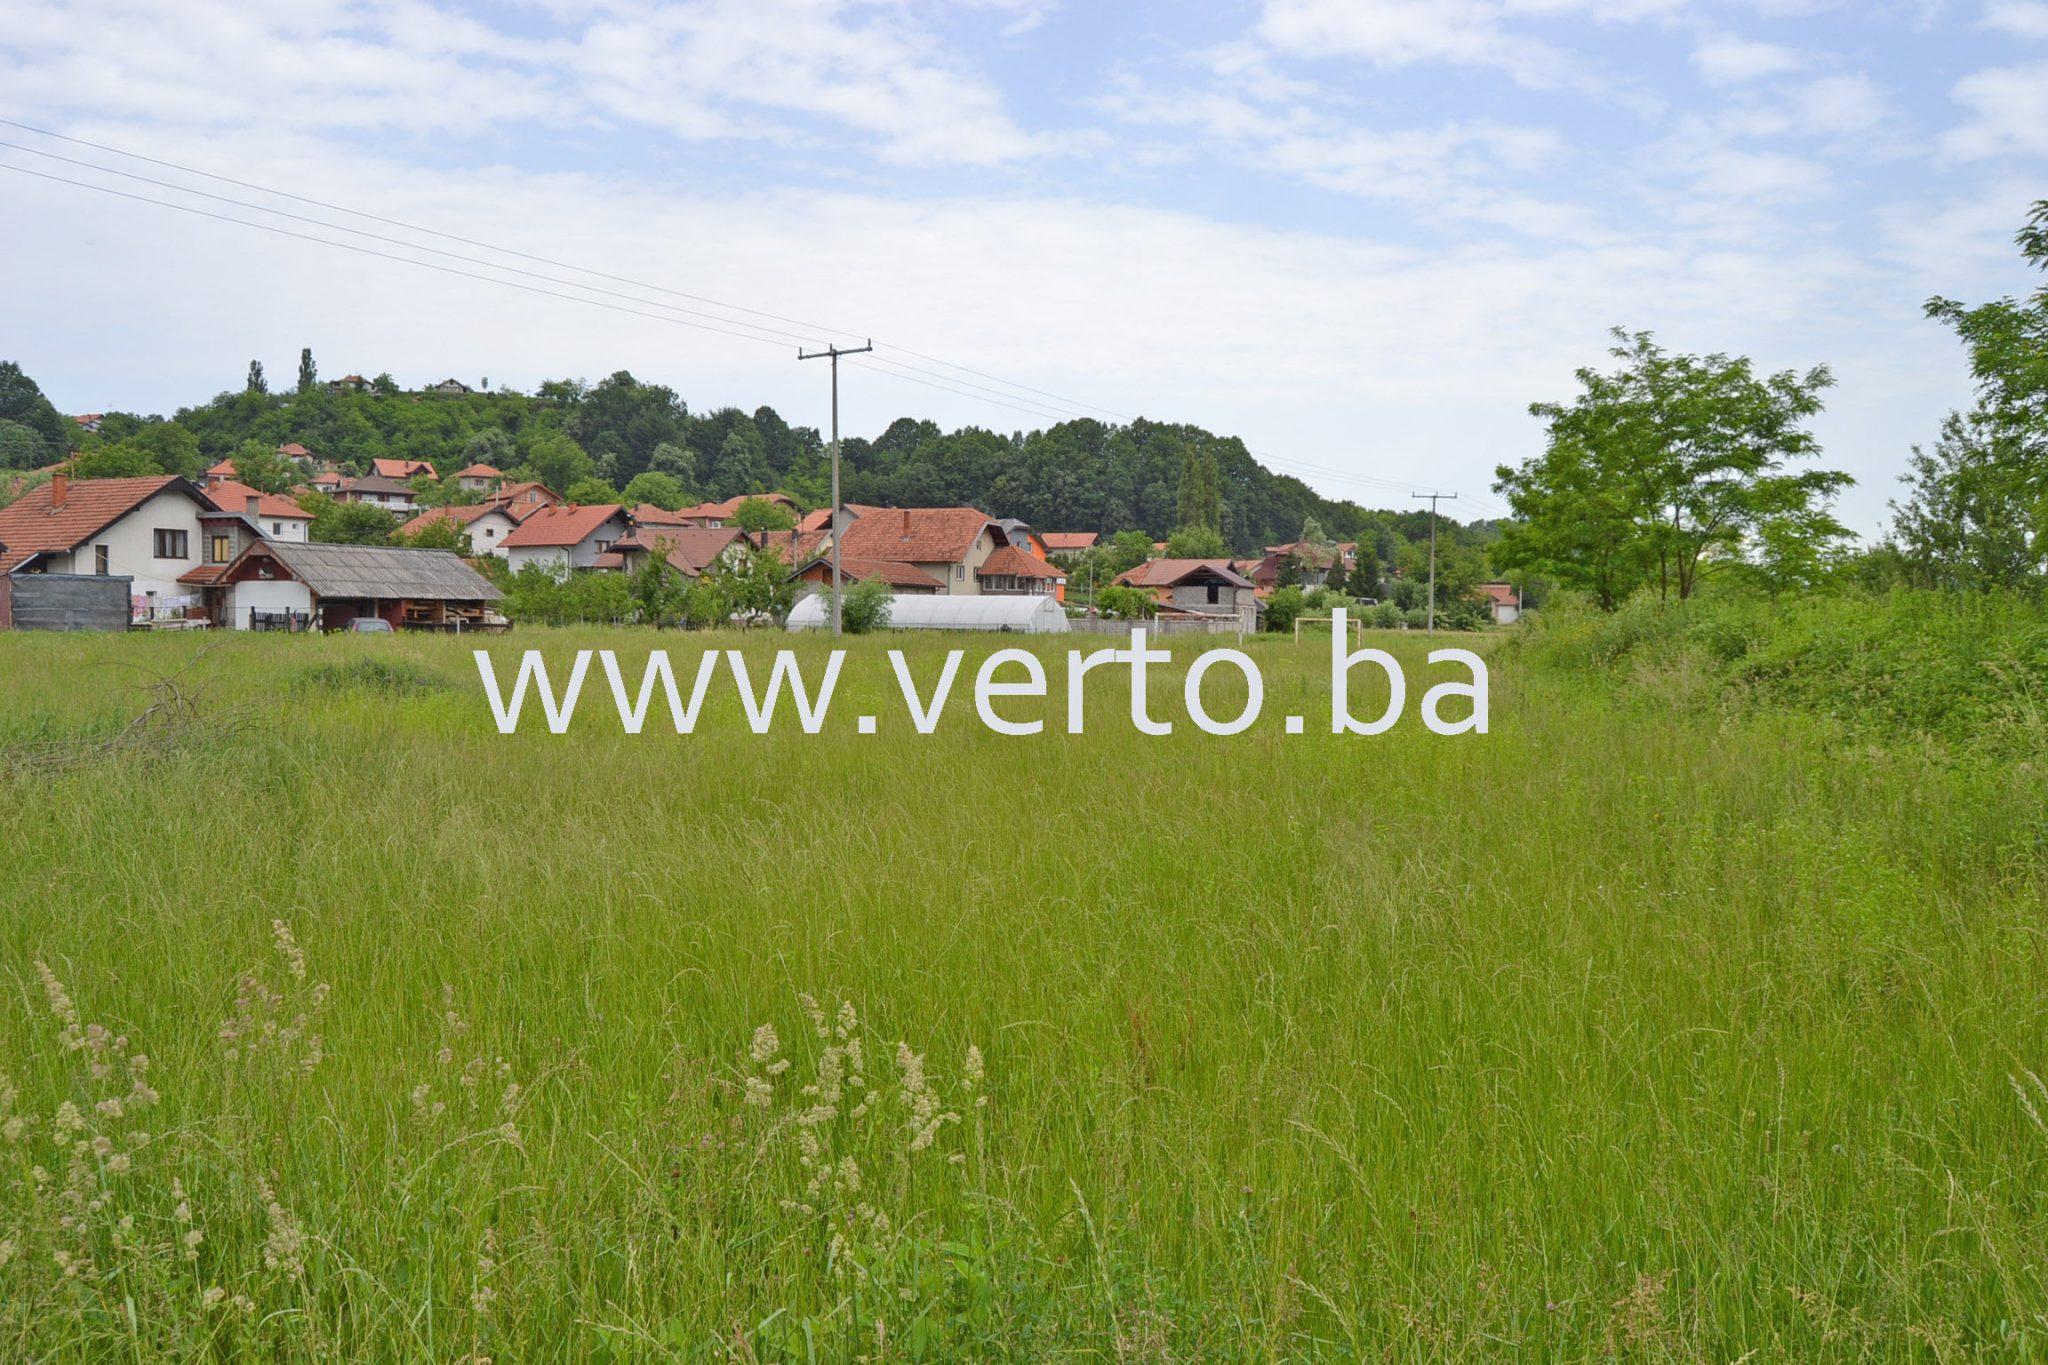 Zemljisna parcela 3284 m2, Mihatovici, Tuzla